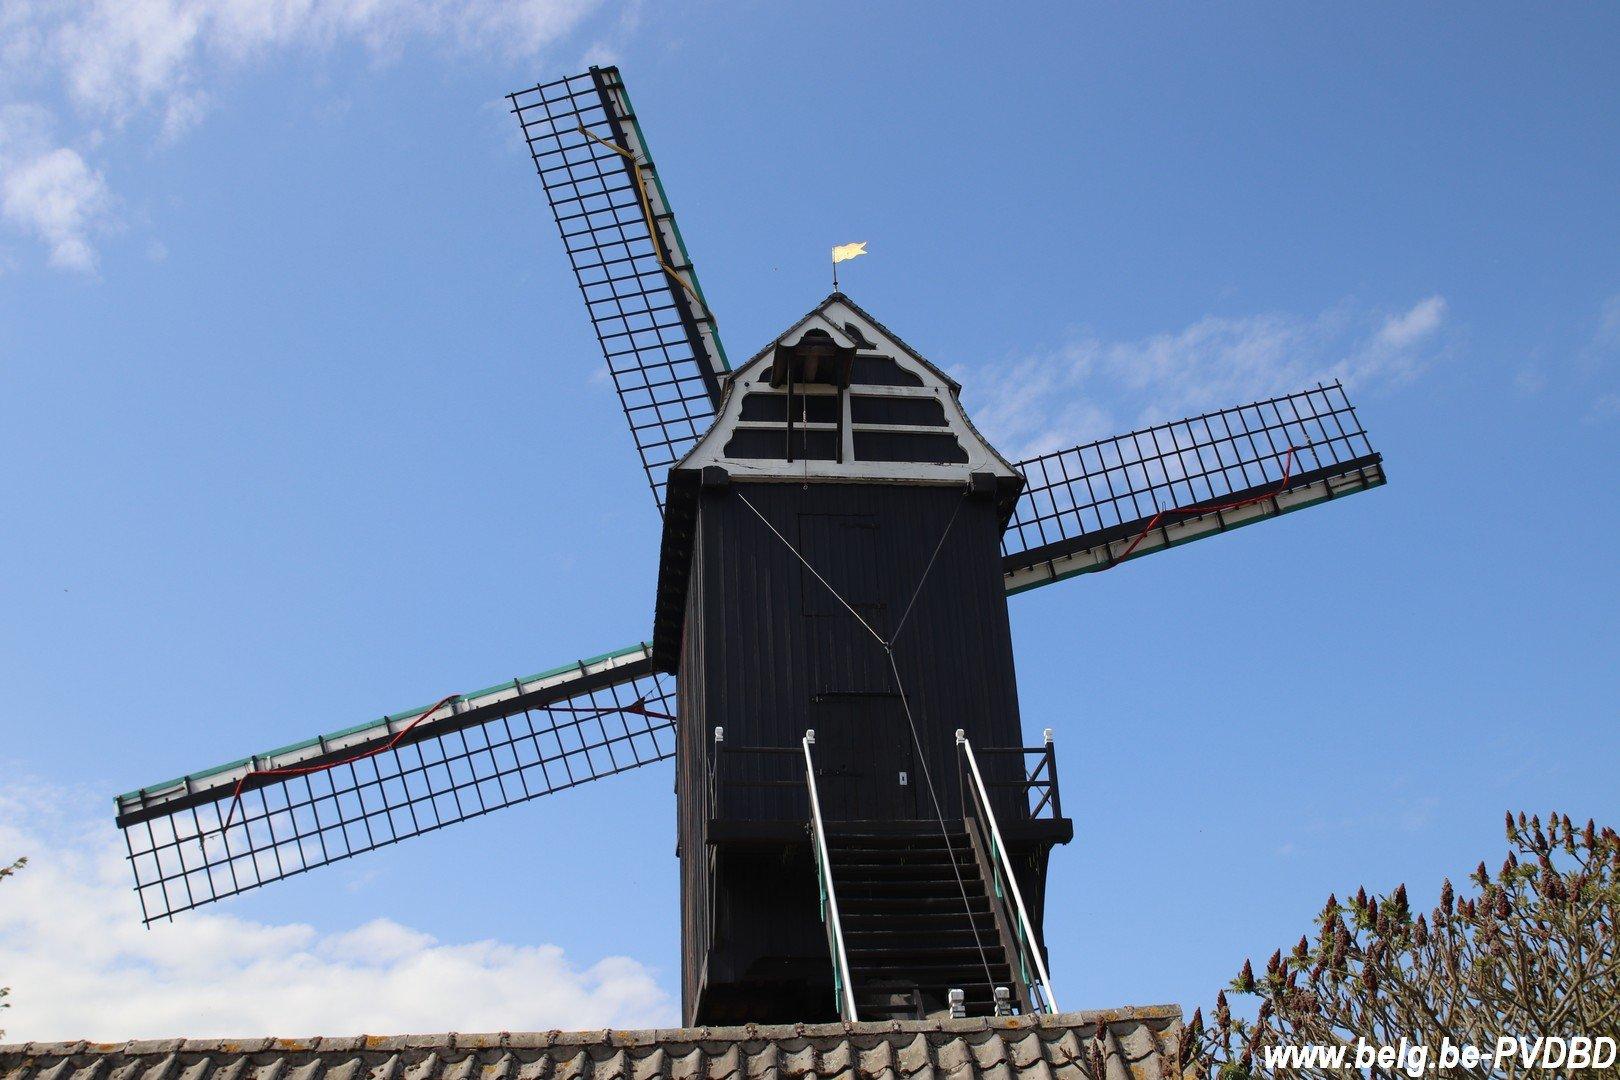 Zondag 28 april erfgoeddag in gans Vlaanderen - IMG 0905